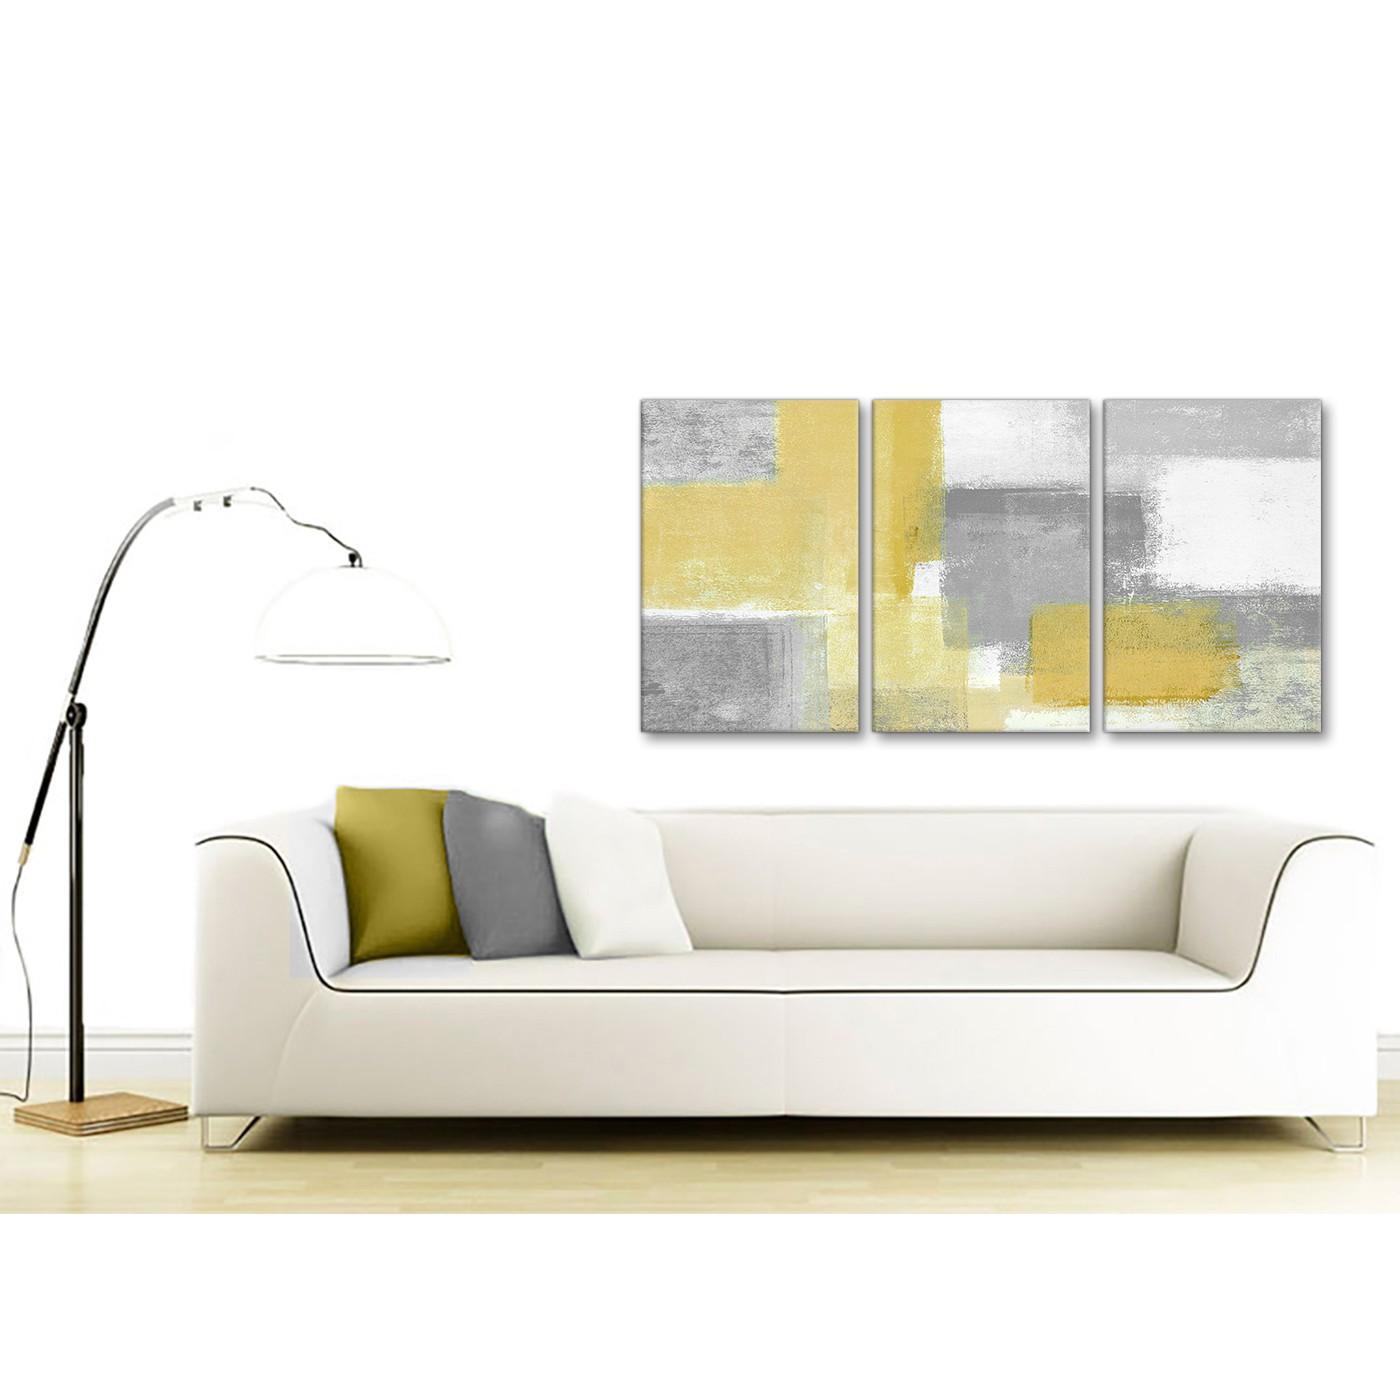 3 Panel Mustard Yellow Grey Kitchen Canvas Wall Art Decor - Abstract ...